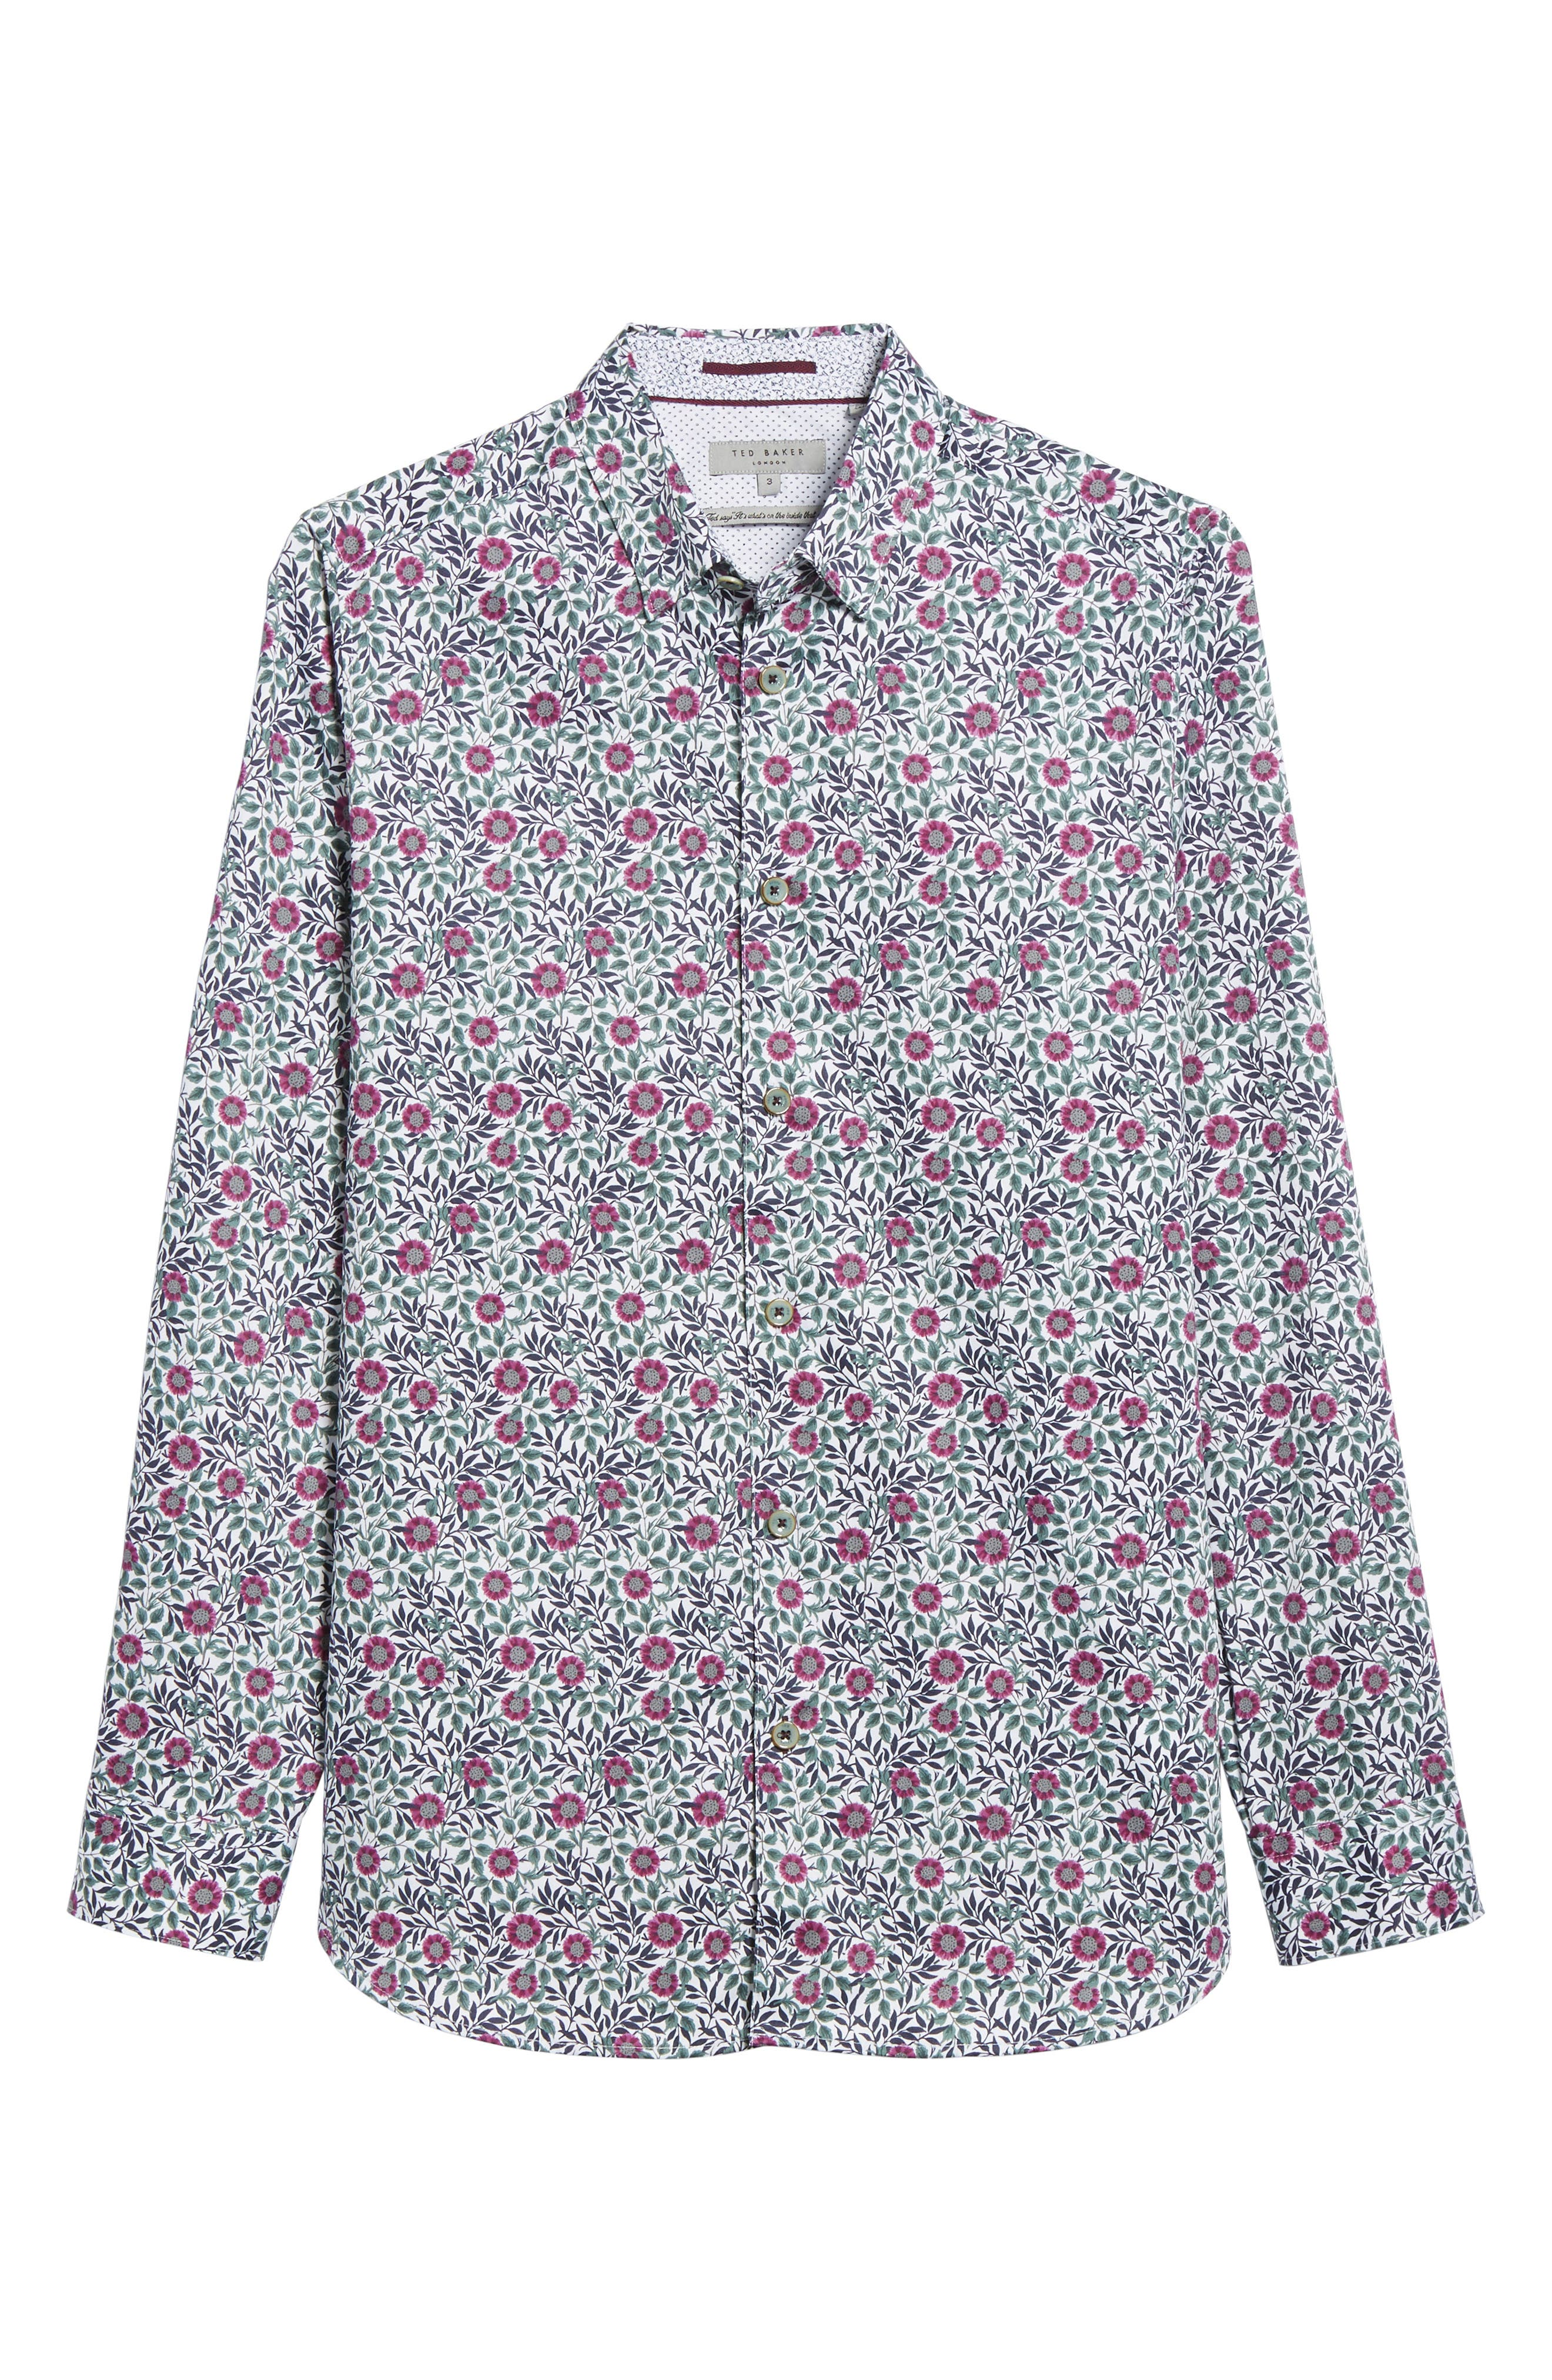 Orense Floral Print Slim Fit Shirt,                             Alternate thumbnail 6, color,                             Green